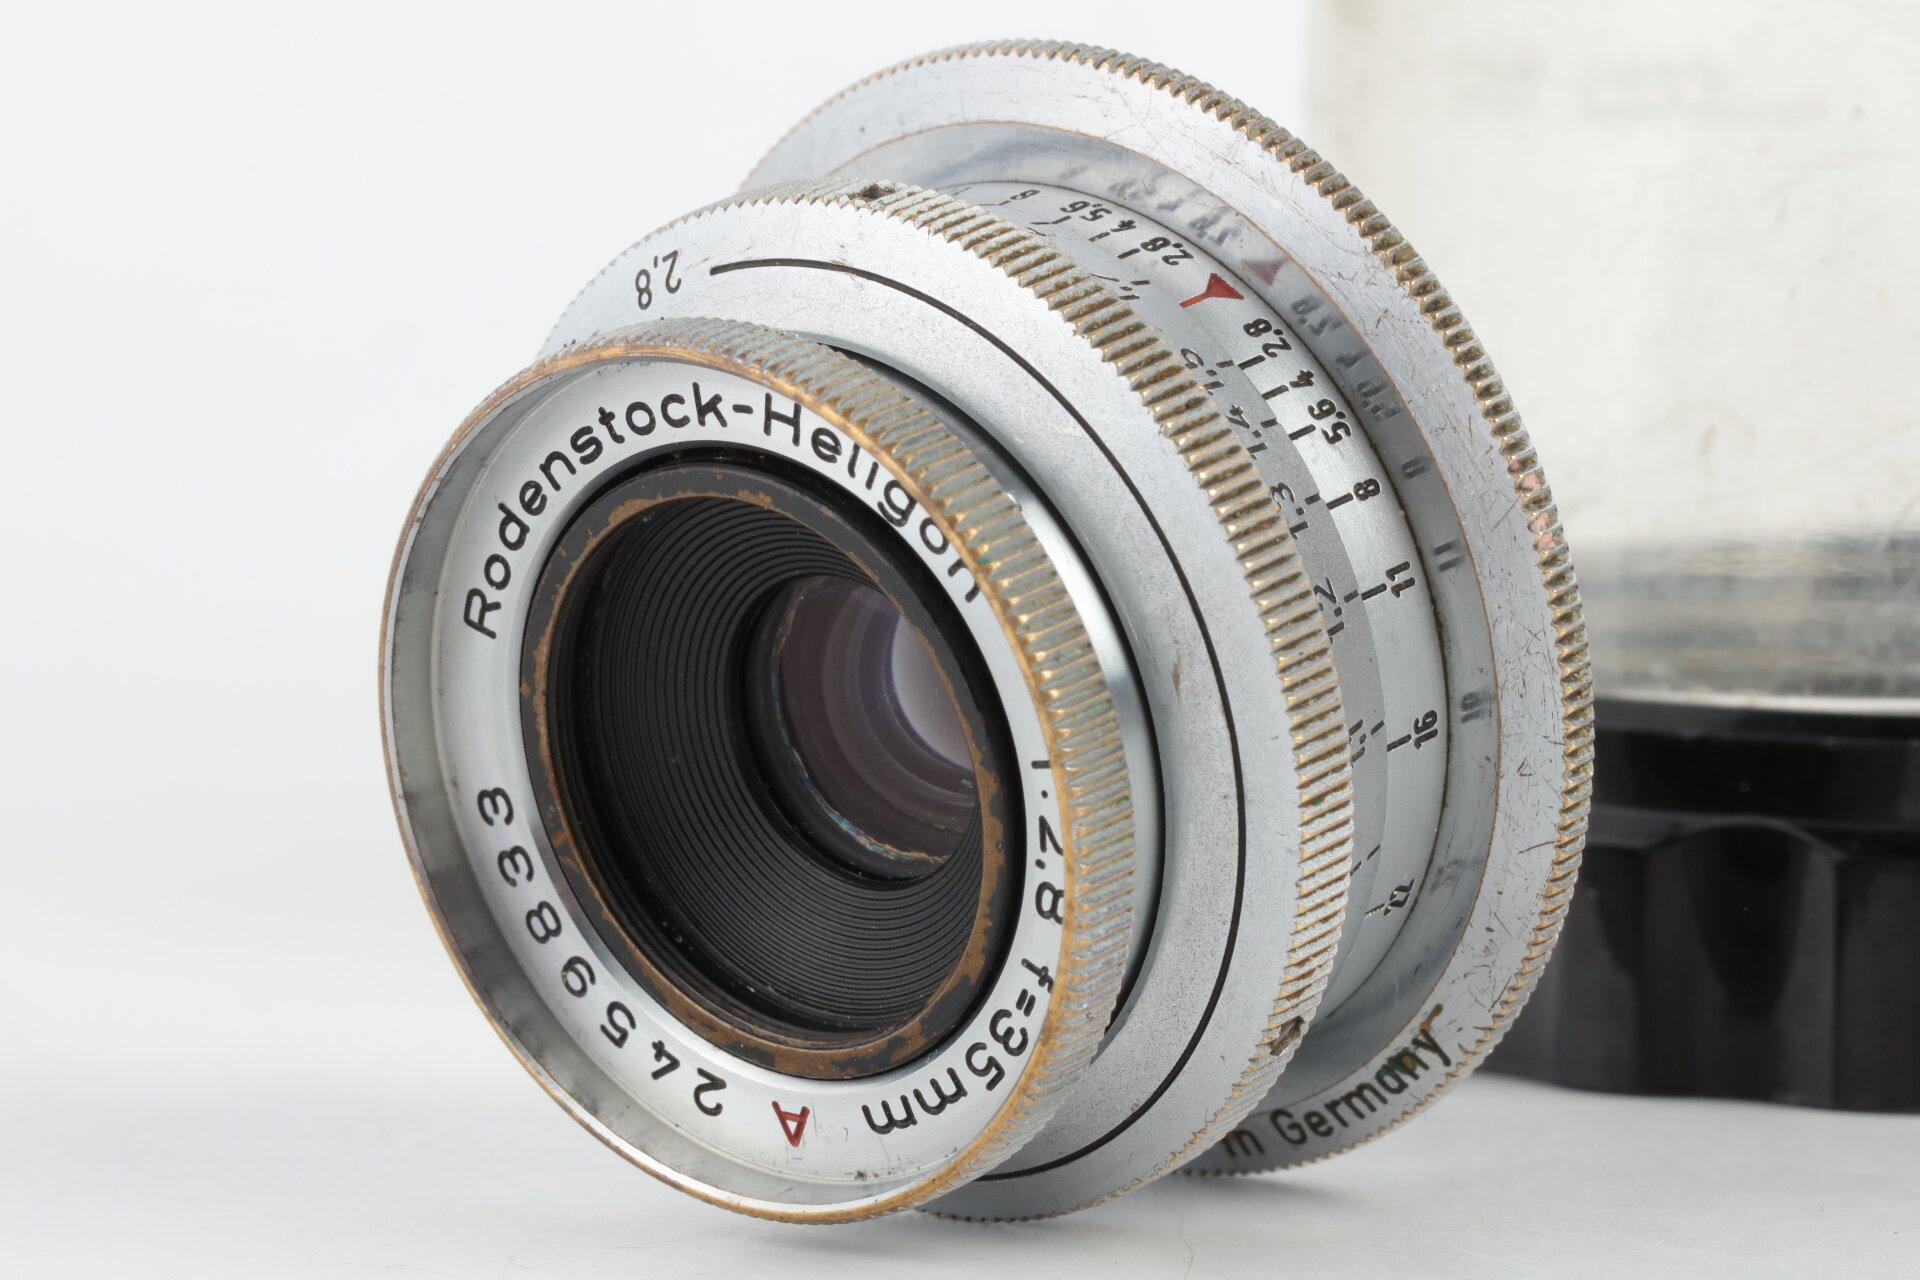 Rodenstock-Heligon 2,8/35mm A M39